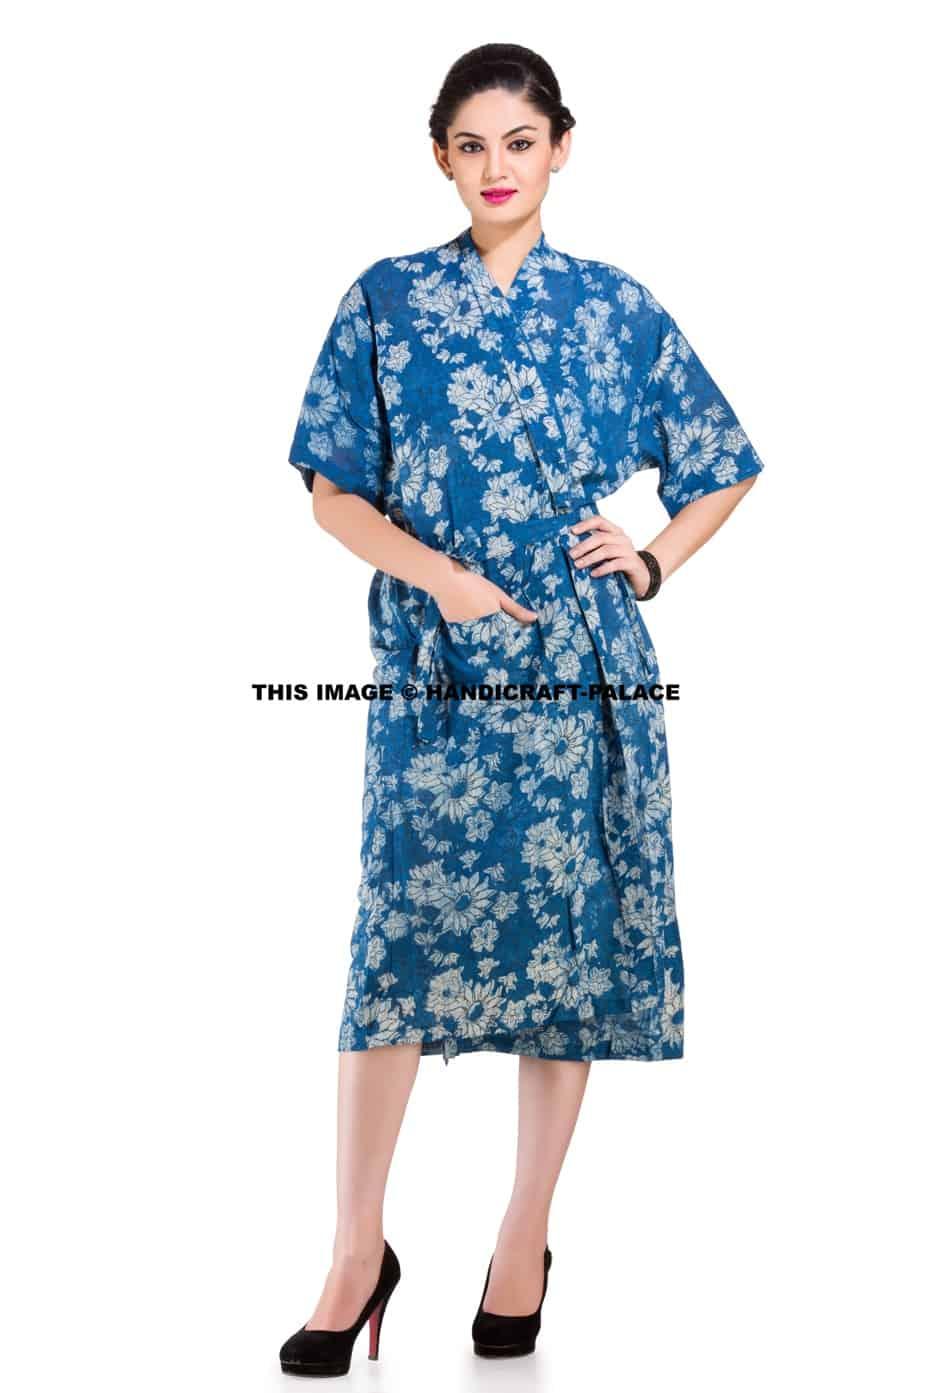 Floral Women s Bath Robe - Handicraft Palace 4367e4db5